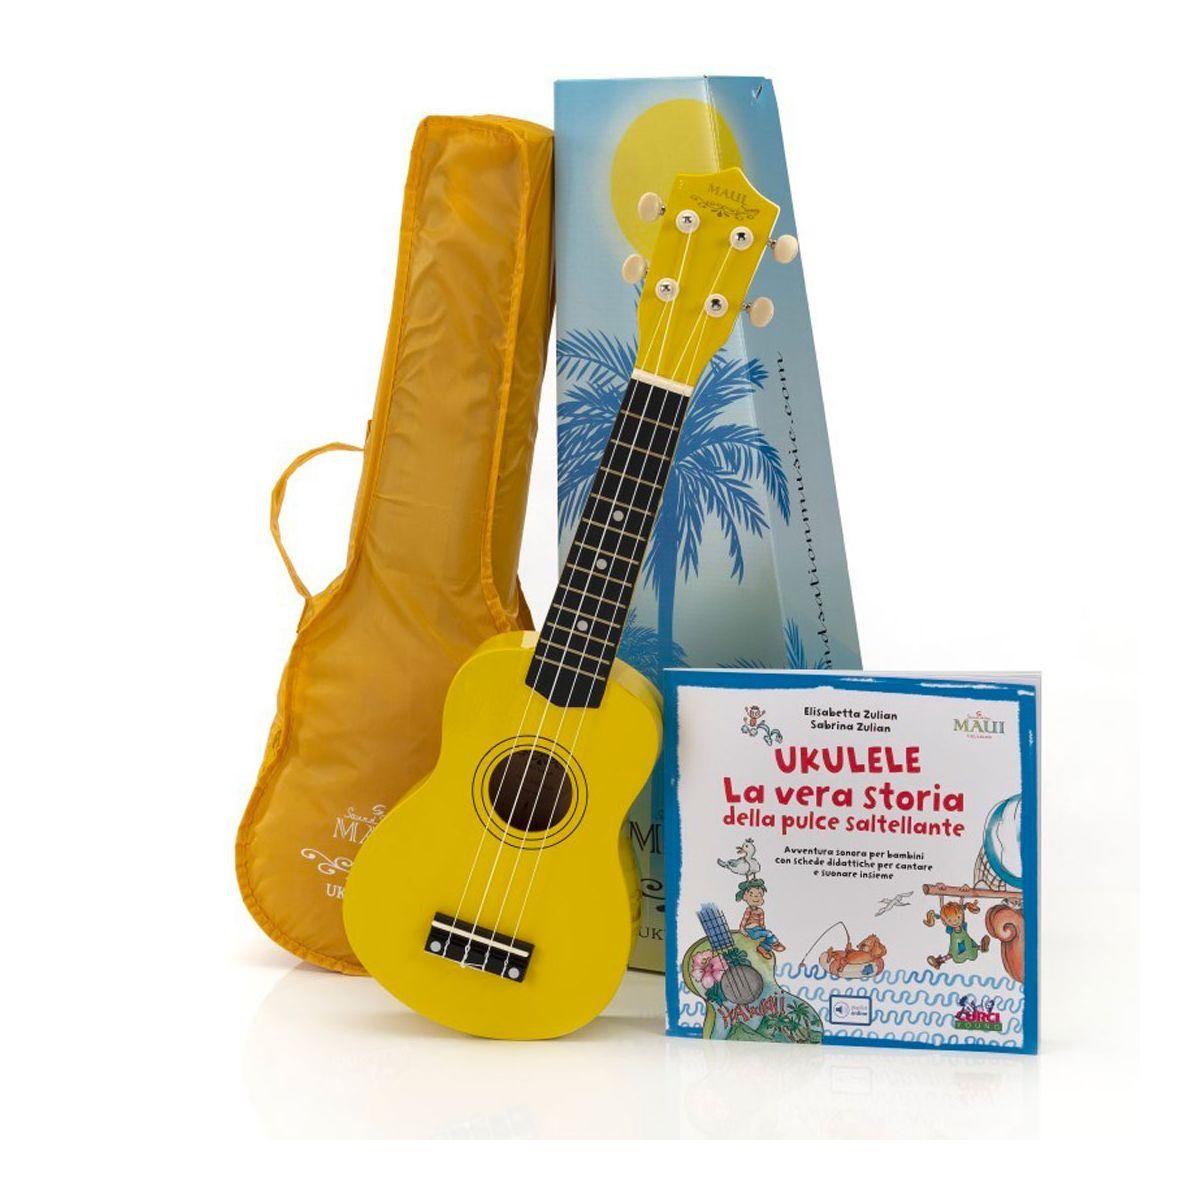 Ukulele soprano Maui SUNNY 10 con borsa yellow